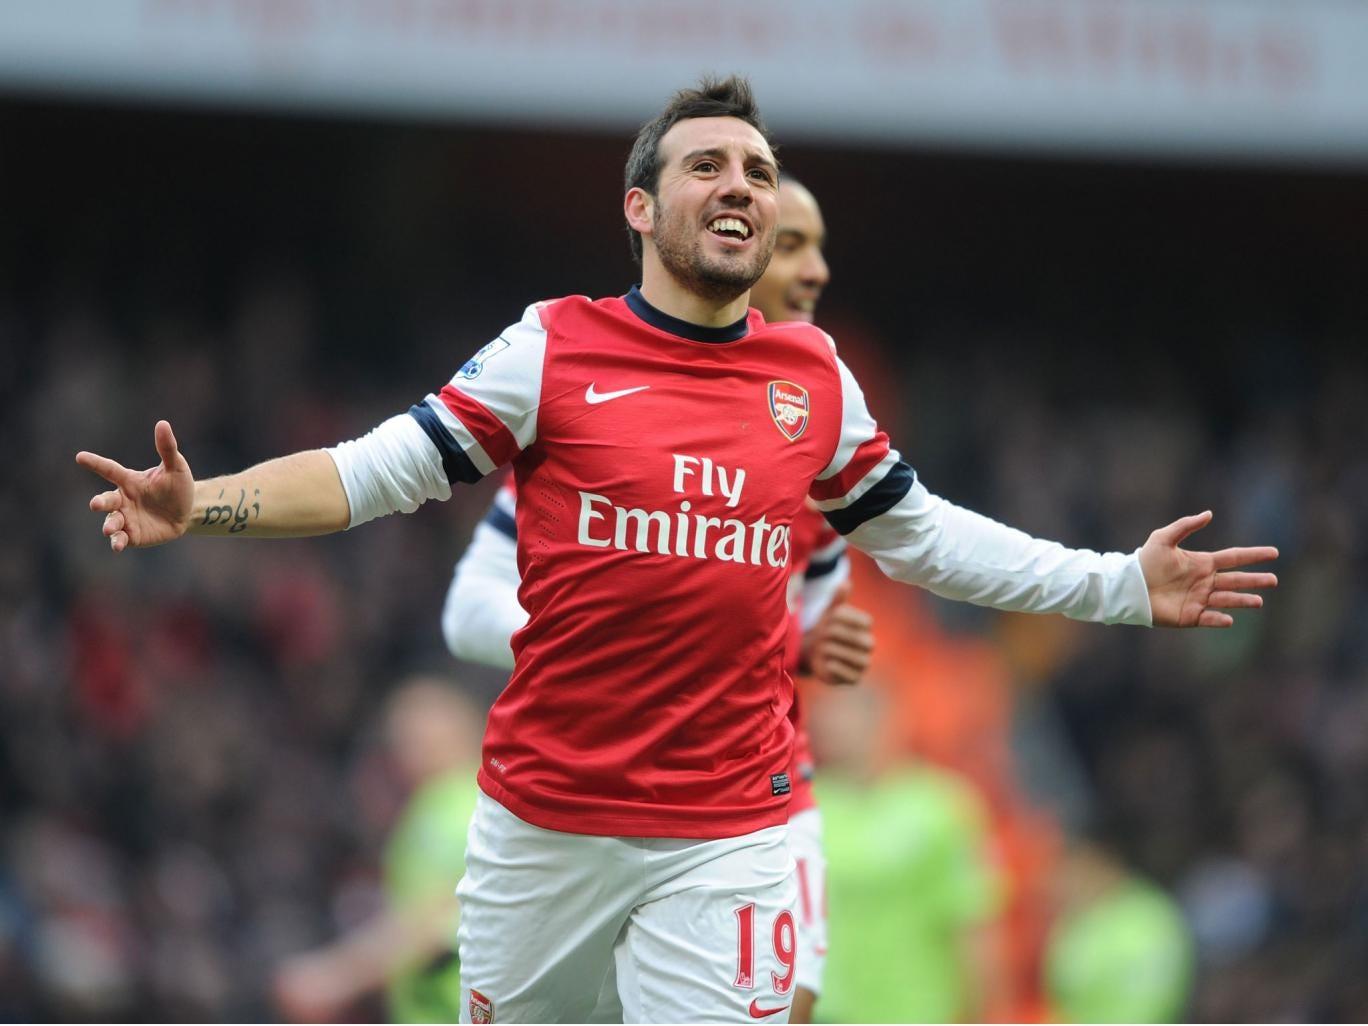 Sant Cazorla opened the scoring for Arsenal